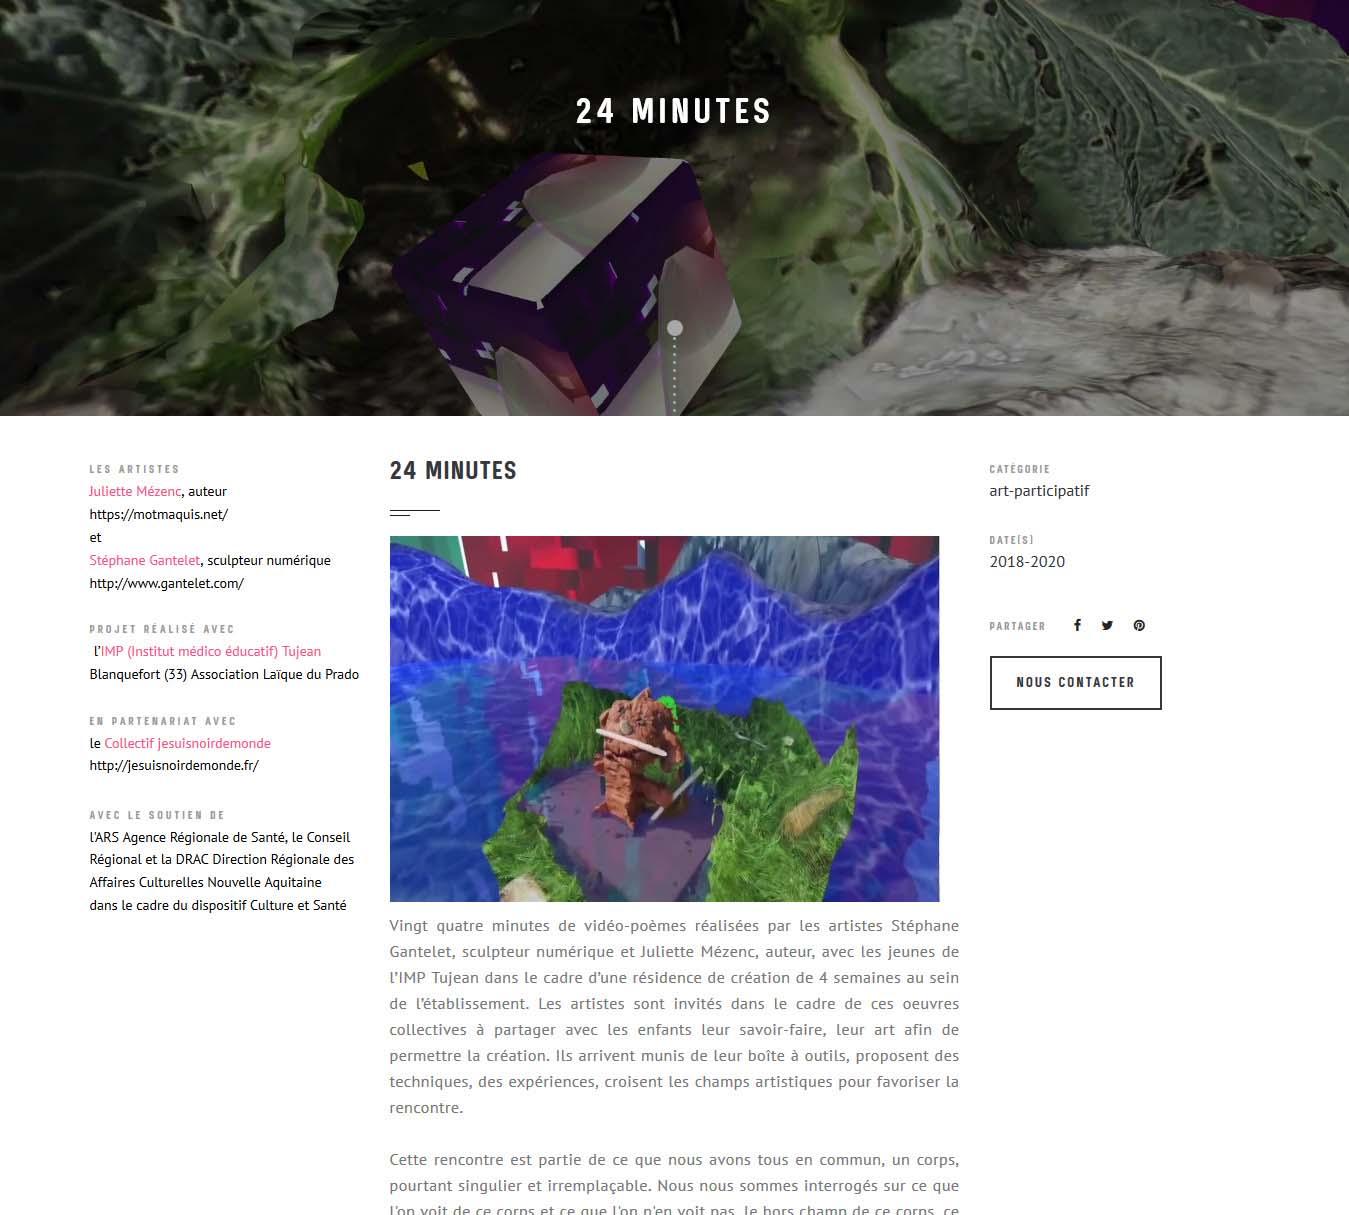 sites de rencontres en ligne artistes rencontres très sensibles